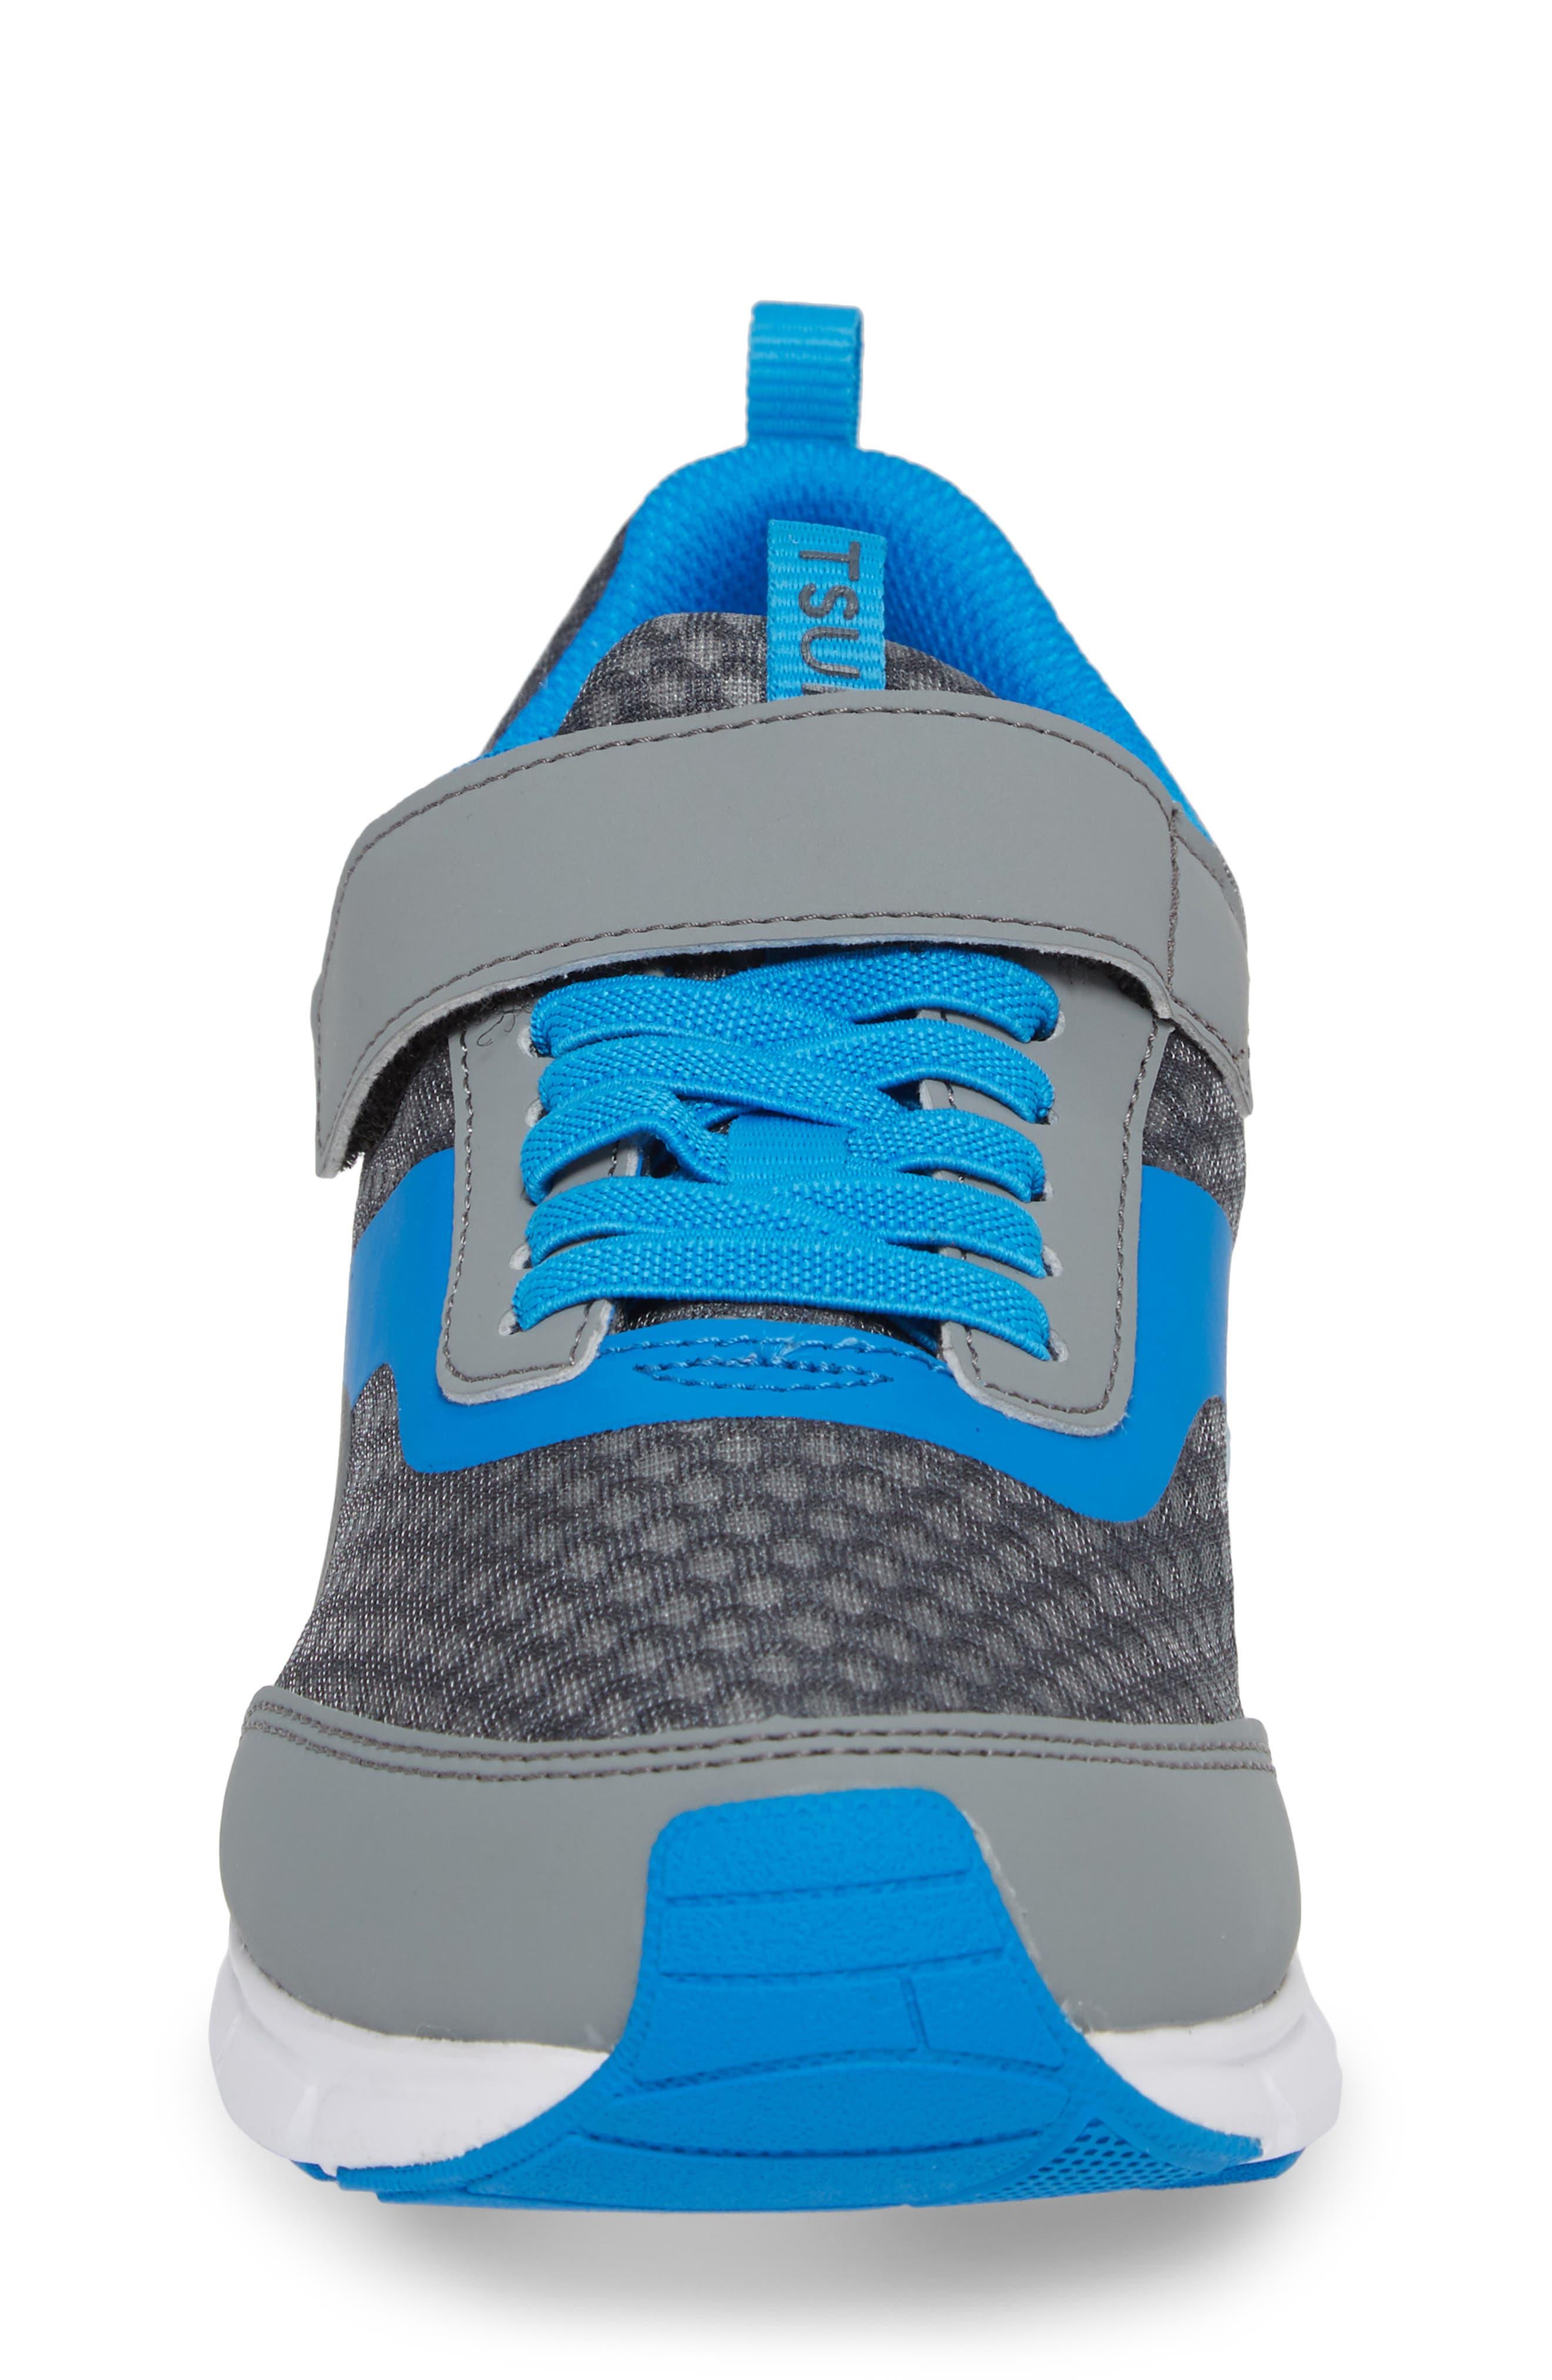 Sonic Washable Sneaker,                             Alternate thumbnail 4, color,                             Gray/ Royal